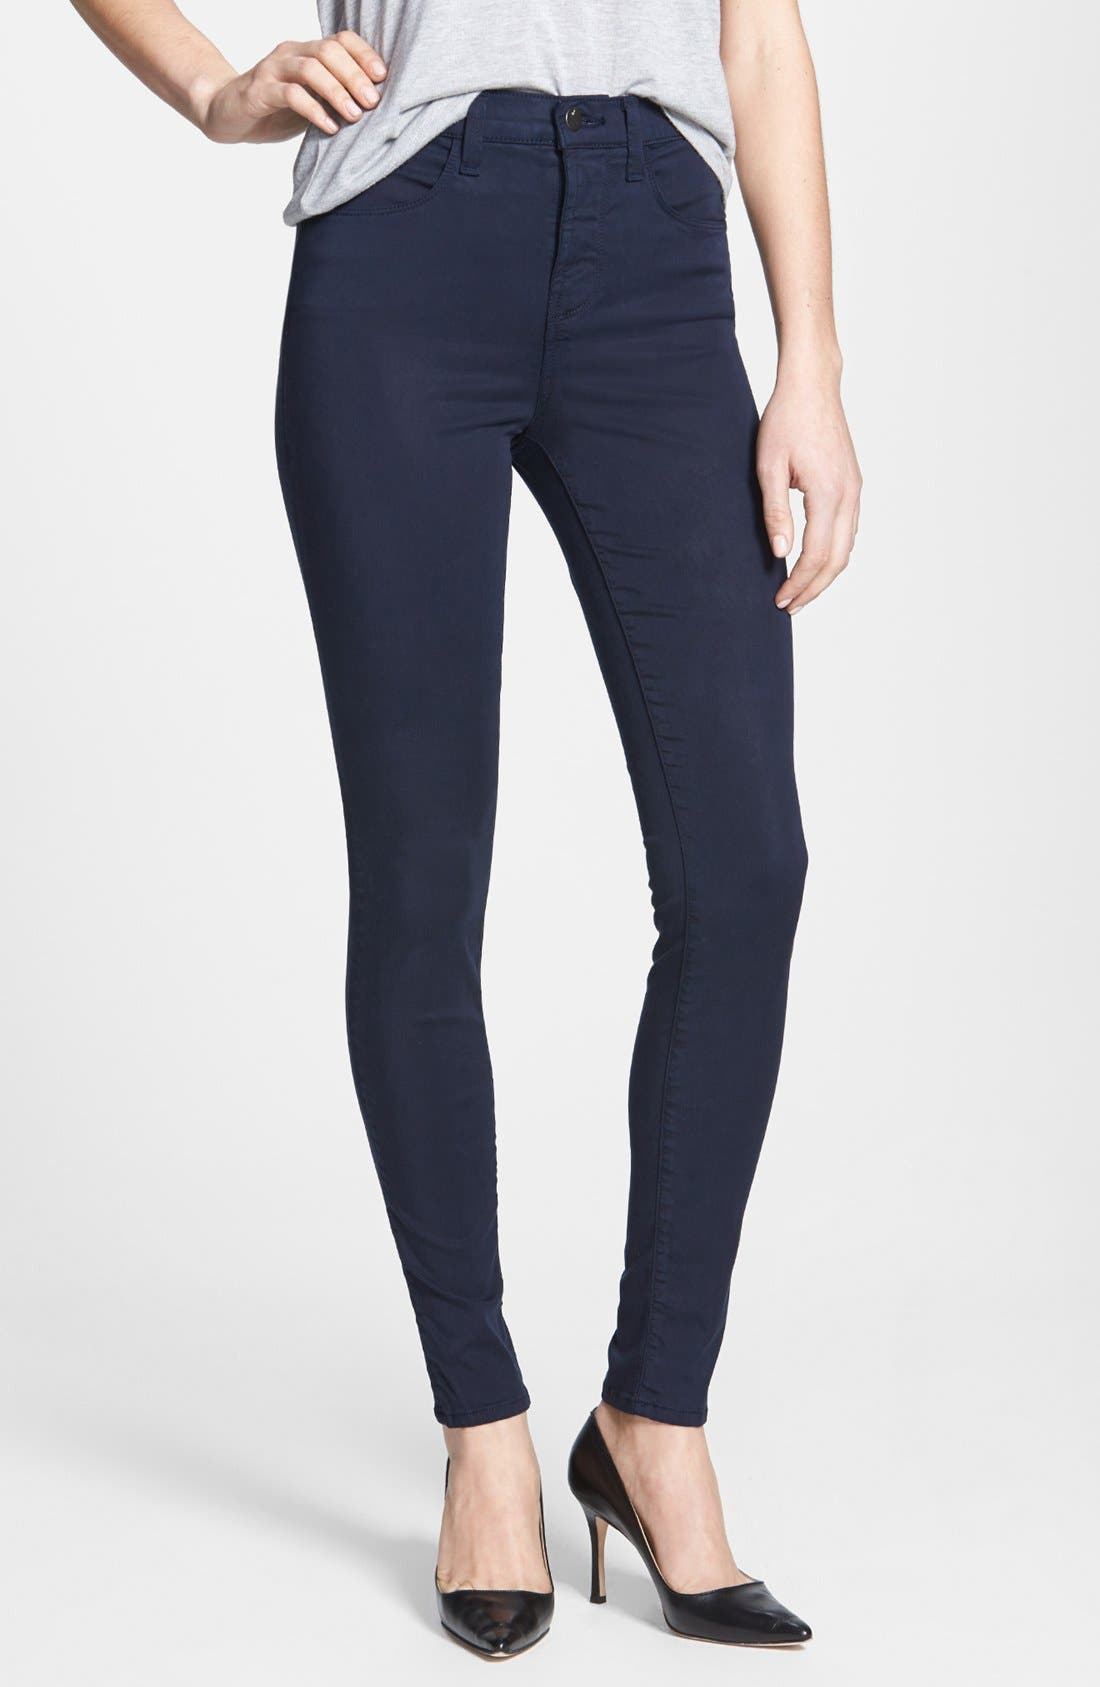 Main Image - J Brand 'Maria 2311' High Rise Skinny Jeans (Marine)